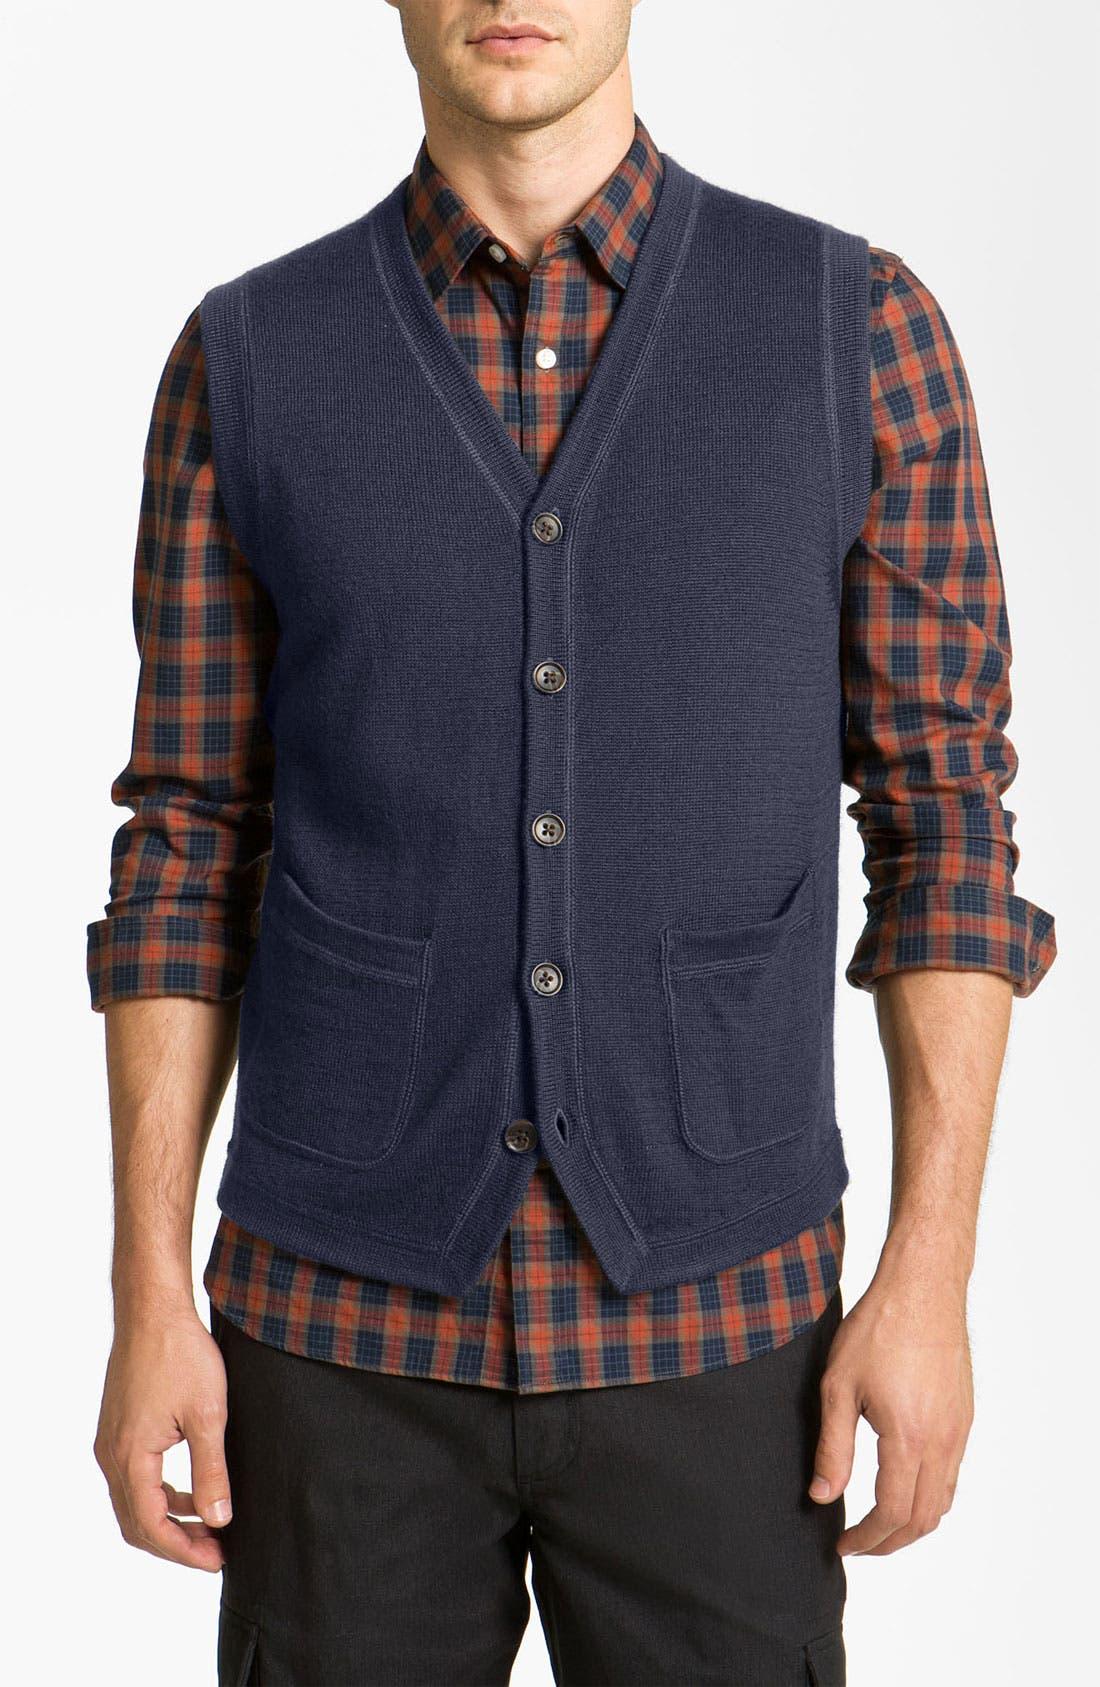 Alternate Image 1 Selected - Wallin & Bros. 'Milton' Trim Fit Vest